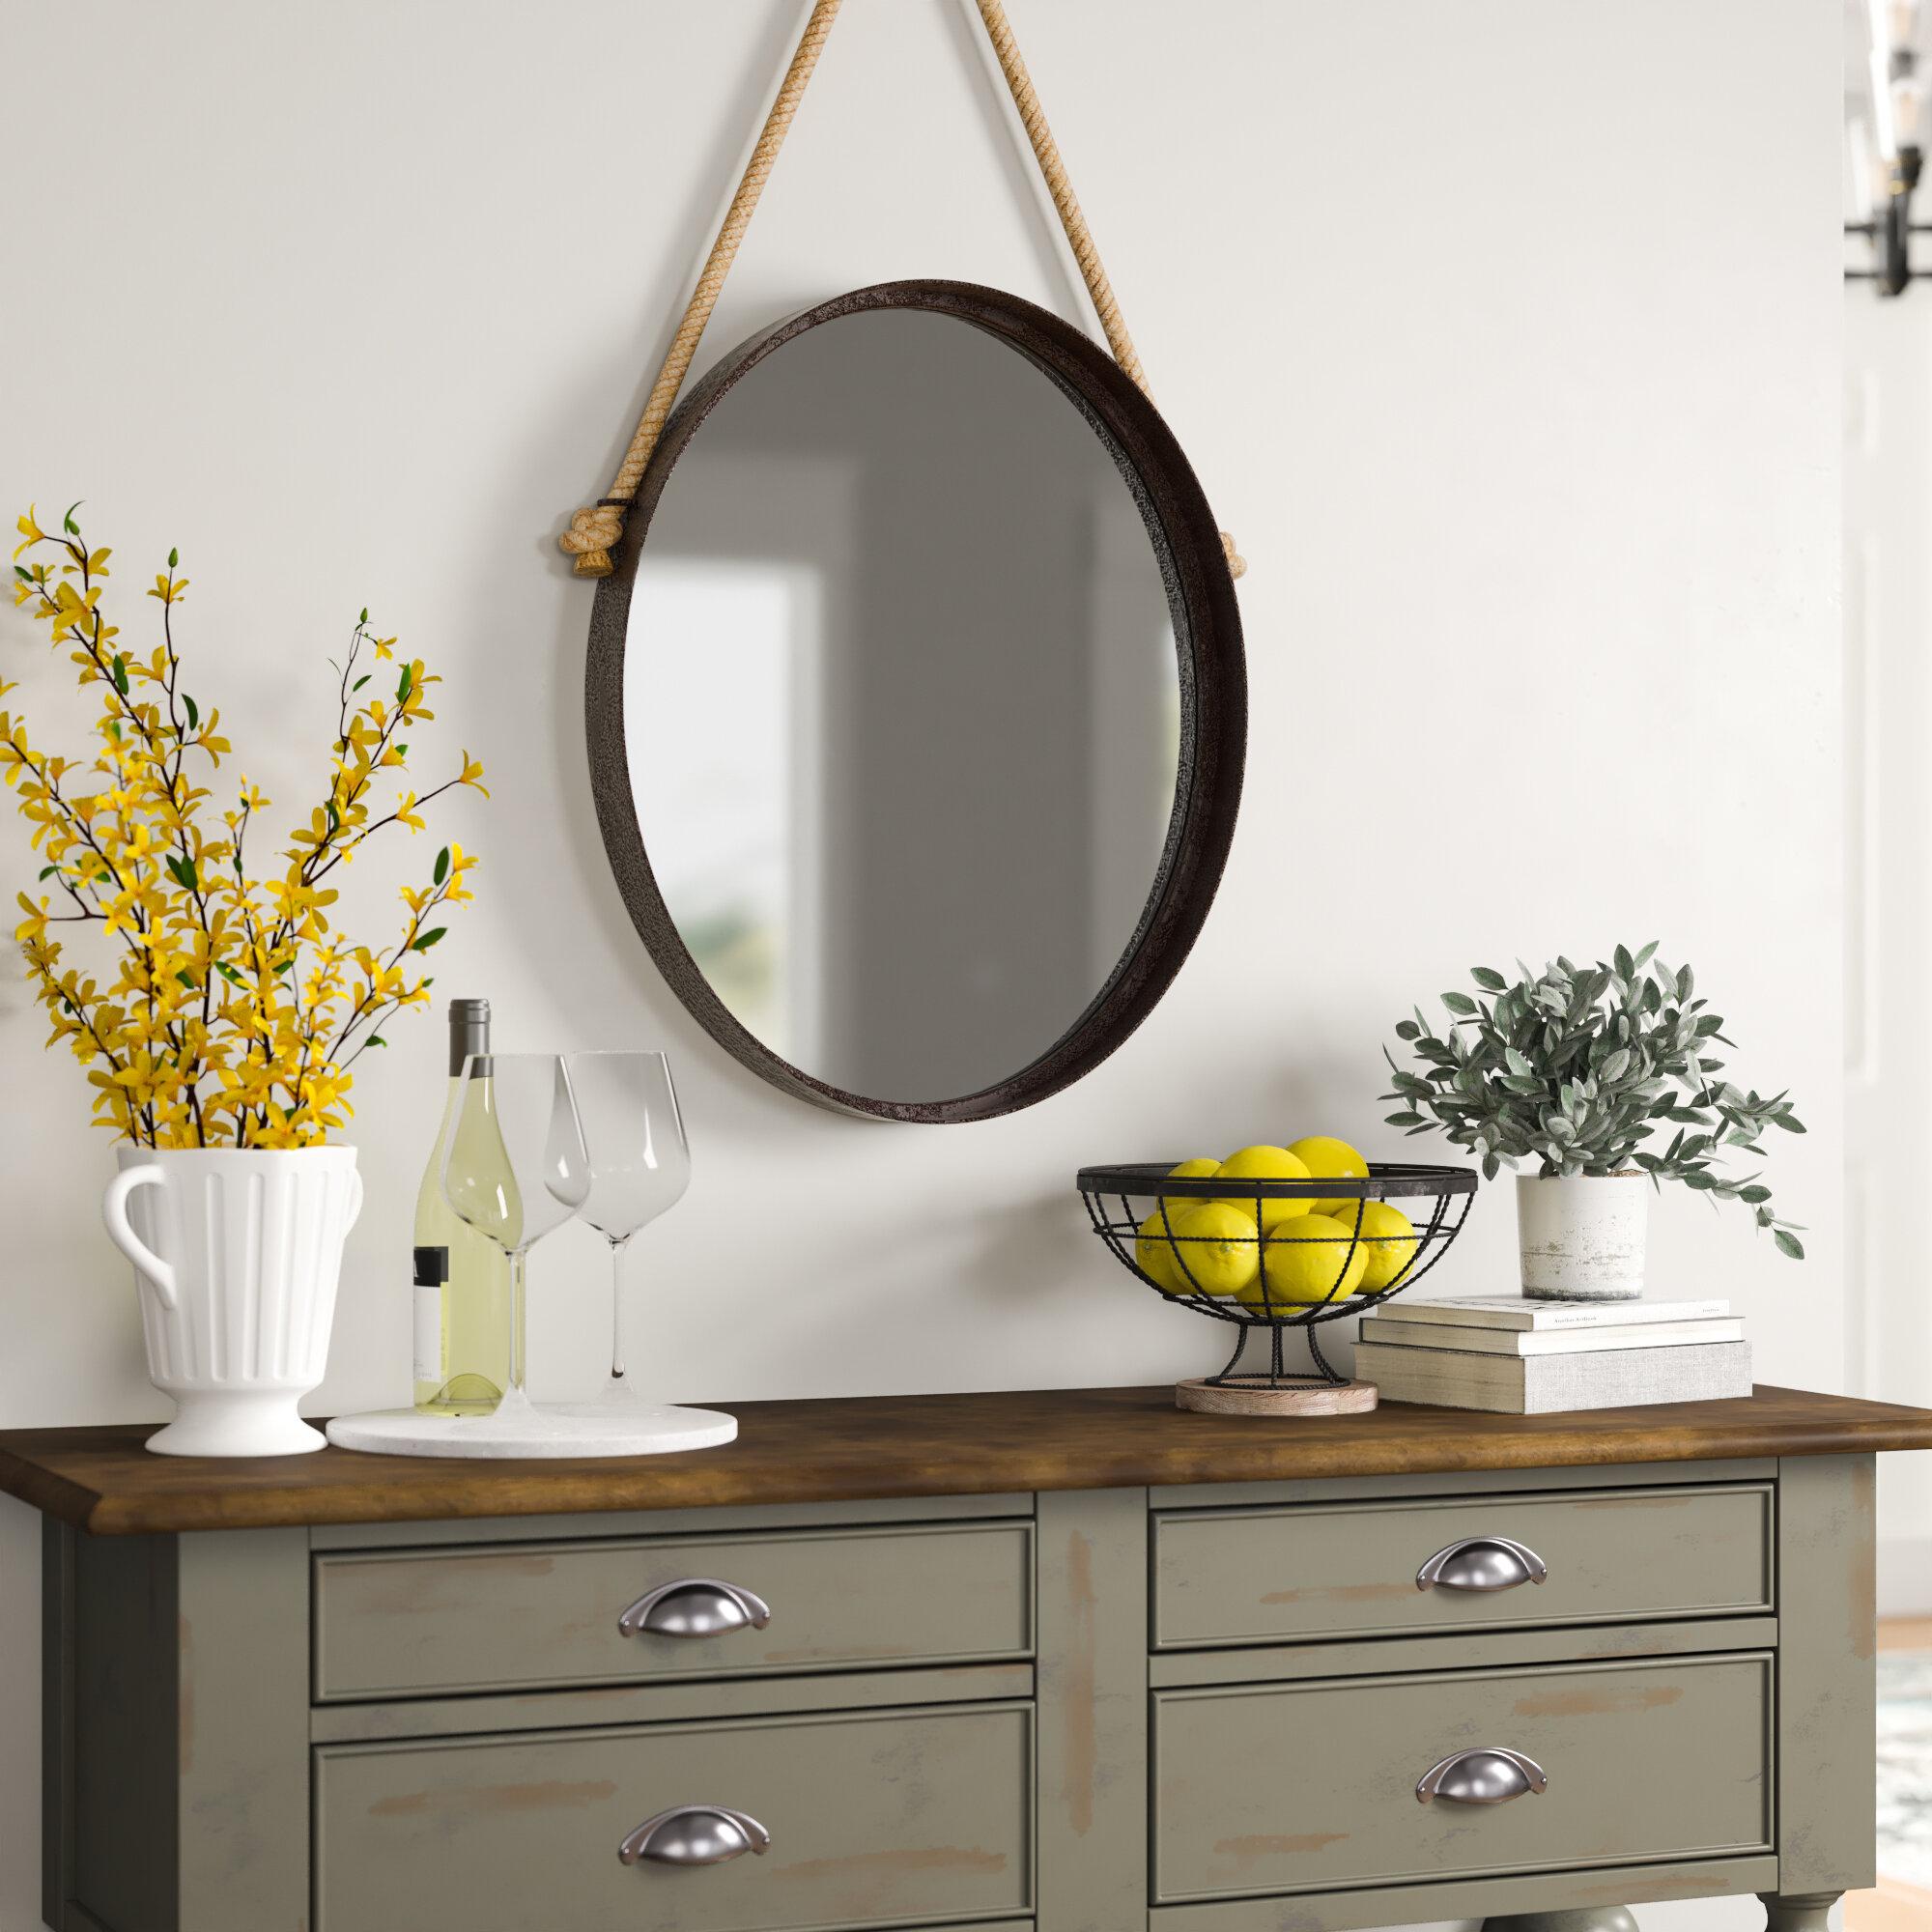 Trent Austin Design Bem Decorative Wall Mirror Intended For Bem Decorative Wall Mirrors (View 6 of 30)